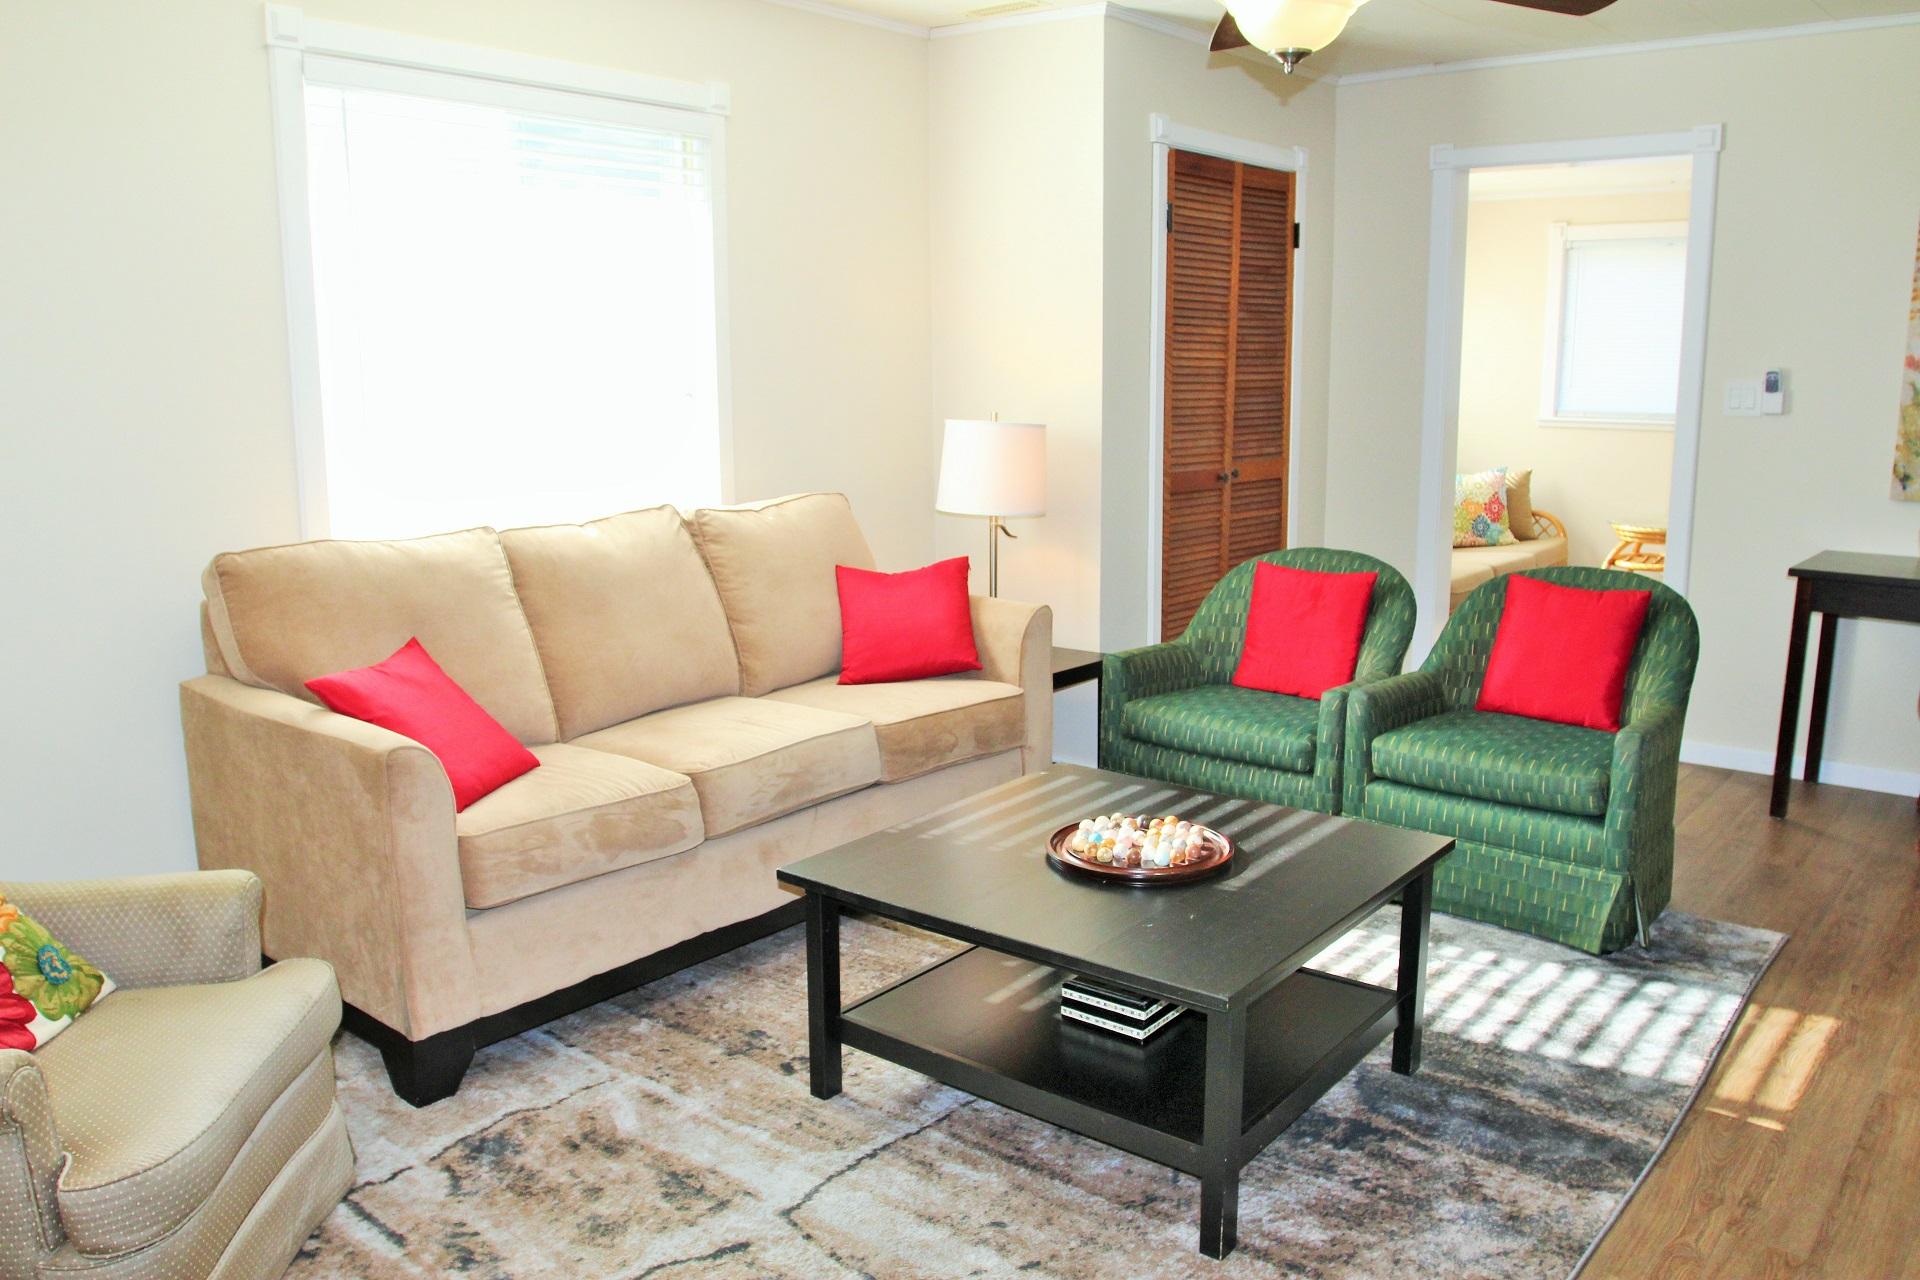 BeebalmCottage-livingroom3-CrystalBeach-HolidayHomesPropertyManagement